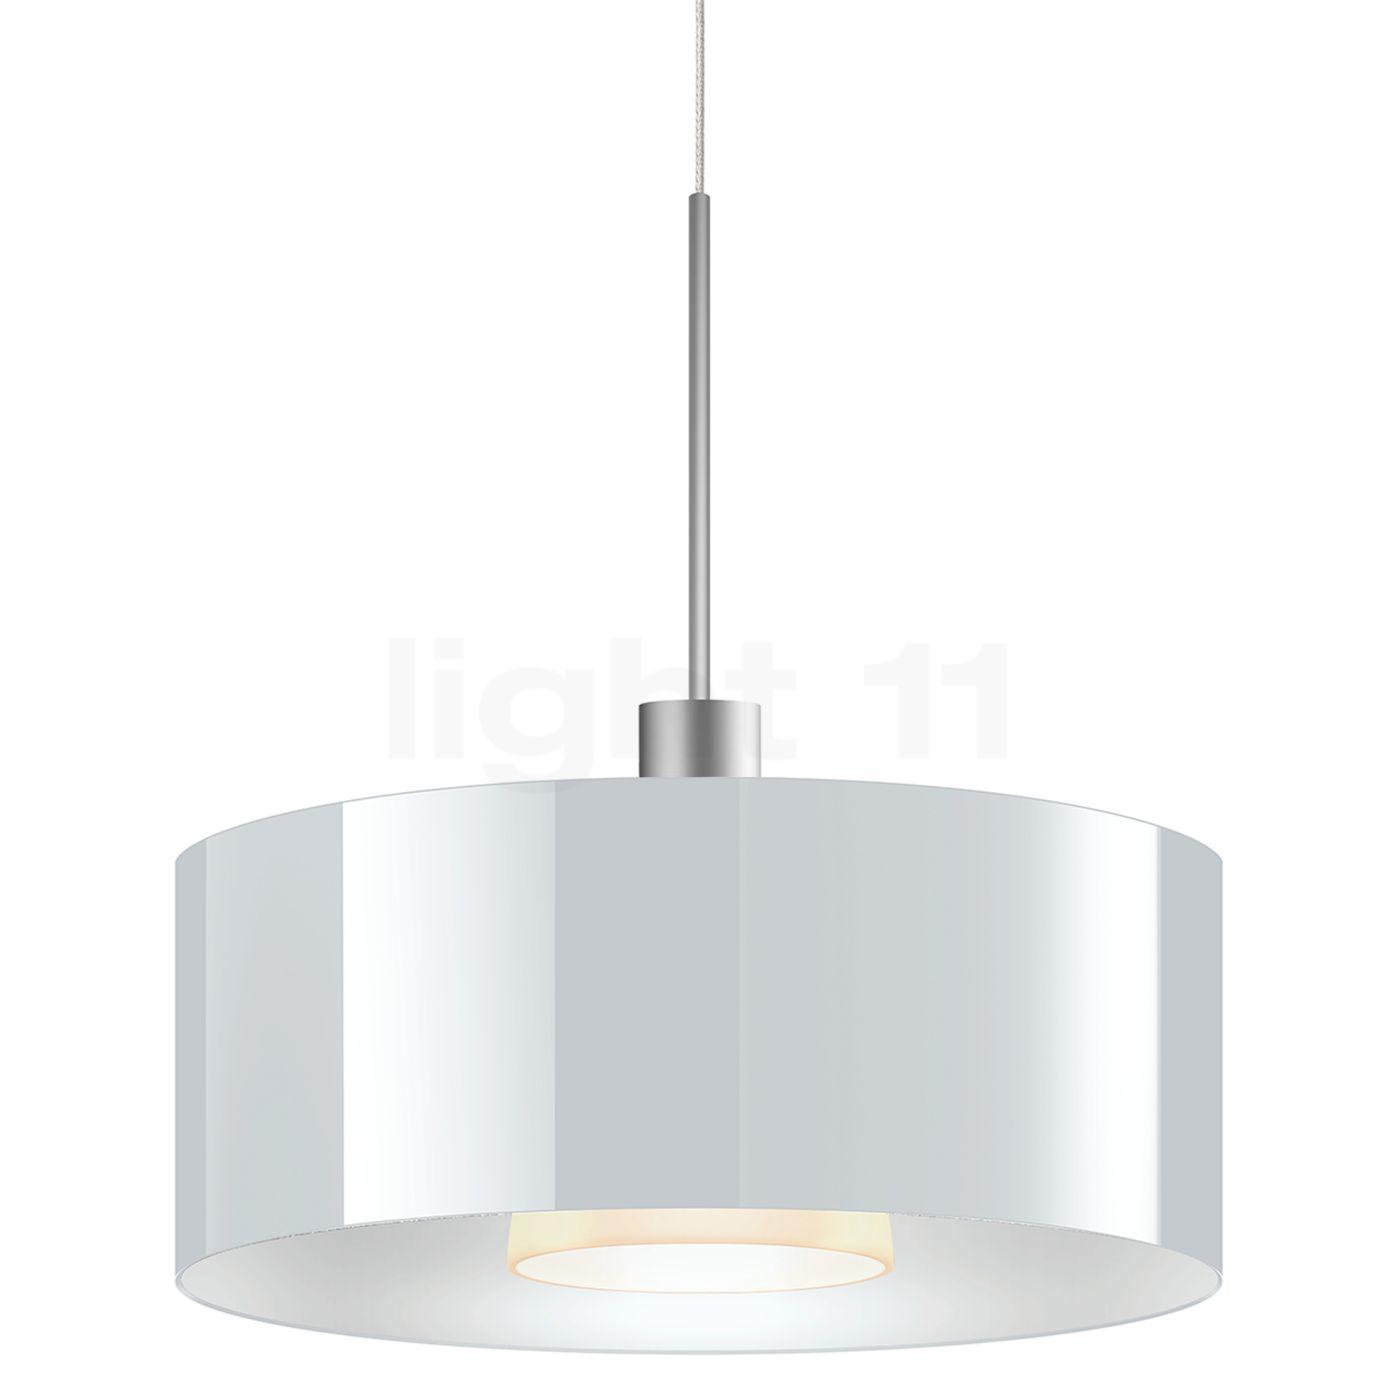 Bruck Cantara Suspension LED basse tension - ø30 cm, chrome mat, verre blanc , Vente d'entrepôt, neuf, emballage d'origine